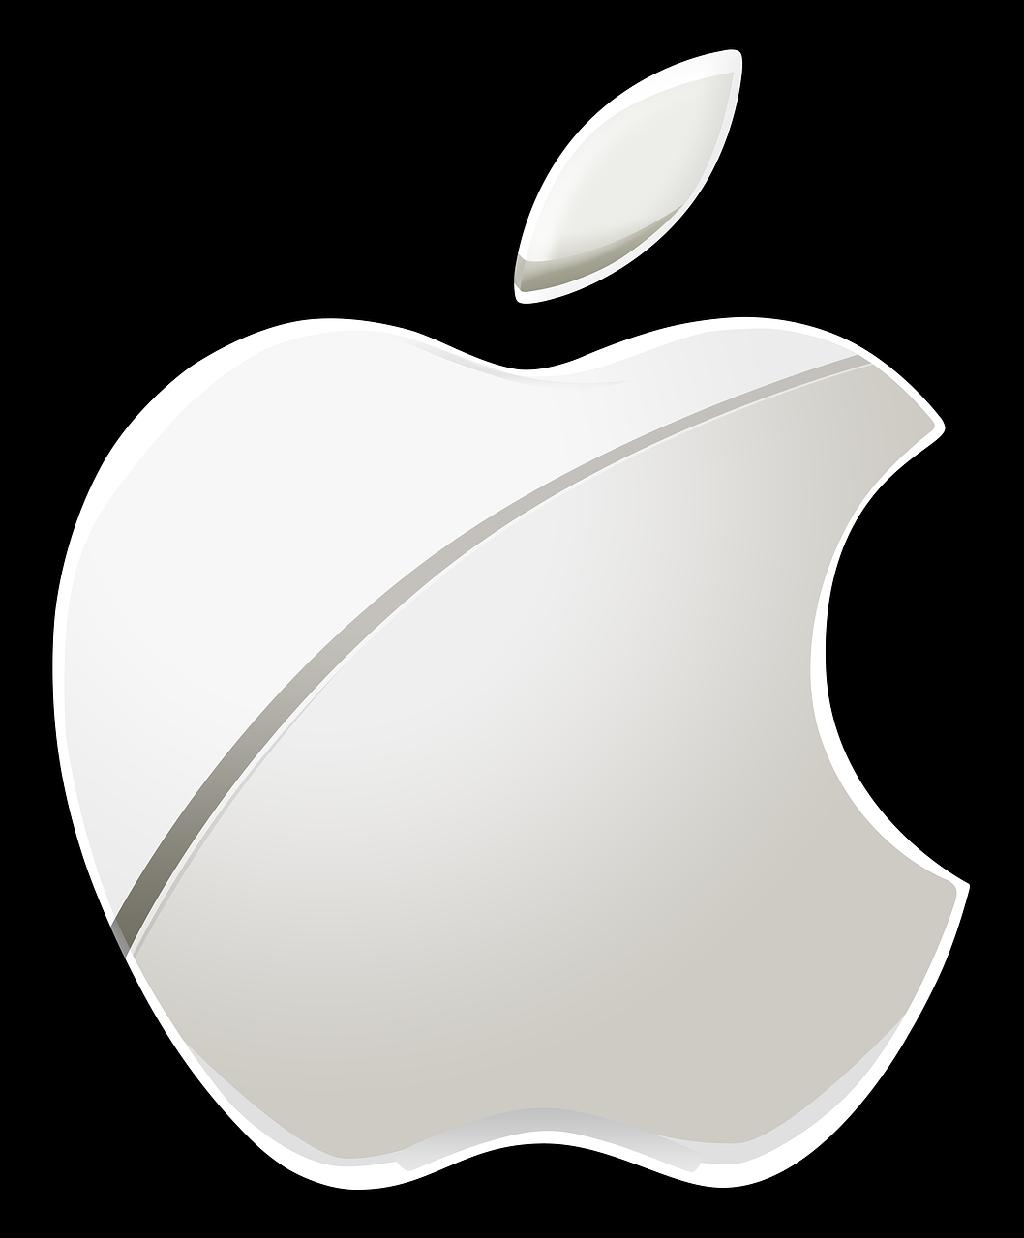 Apple inc logo.